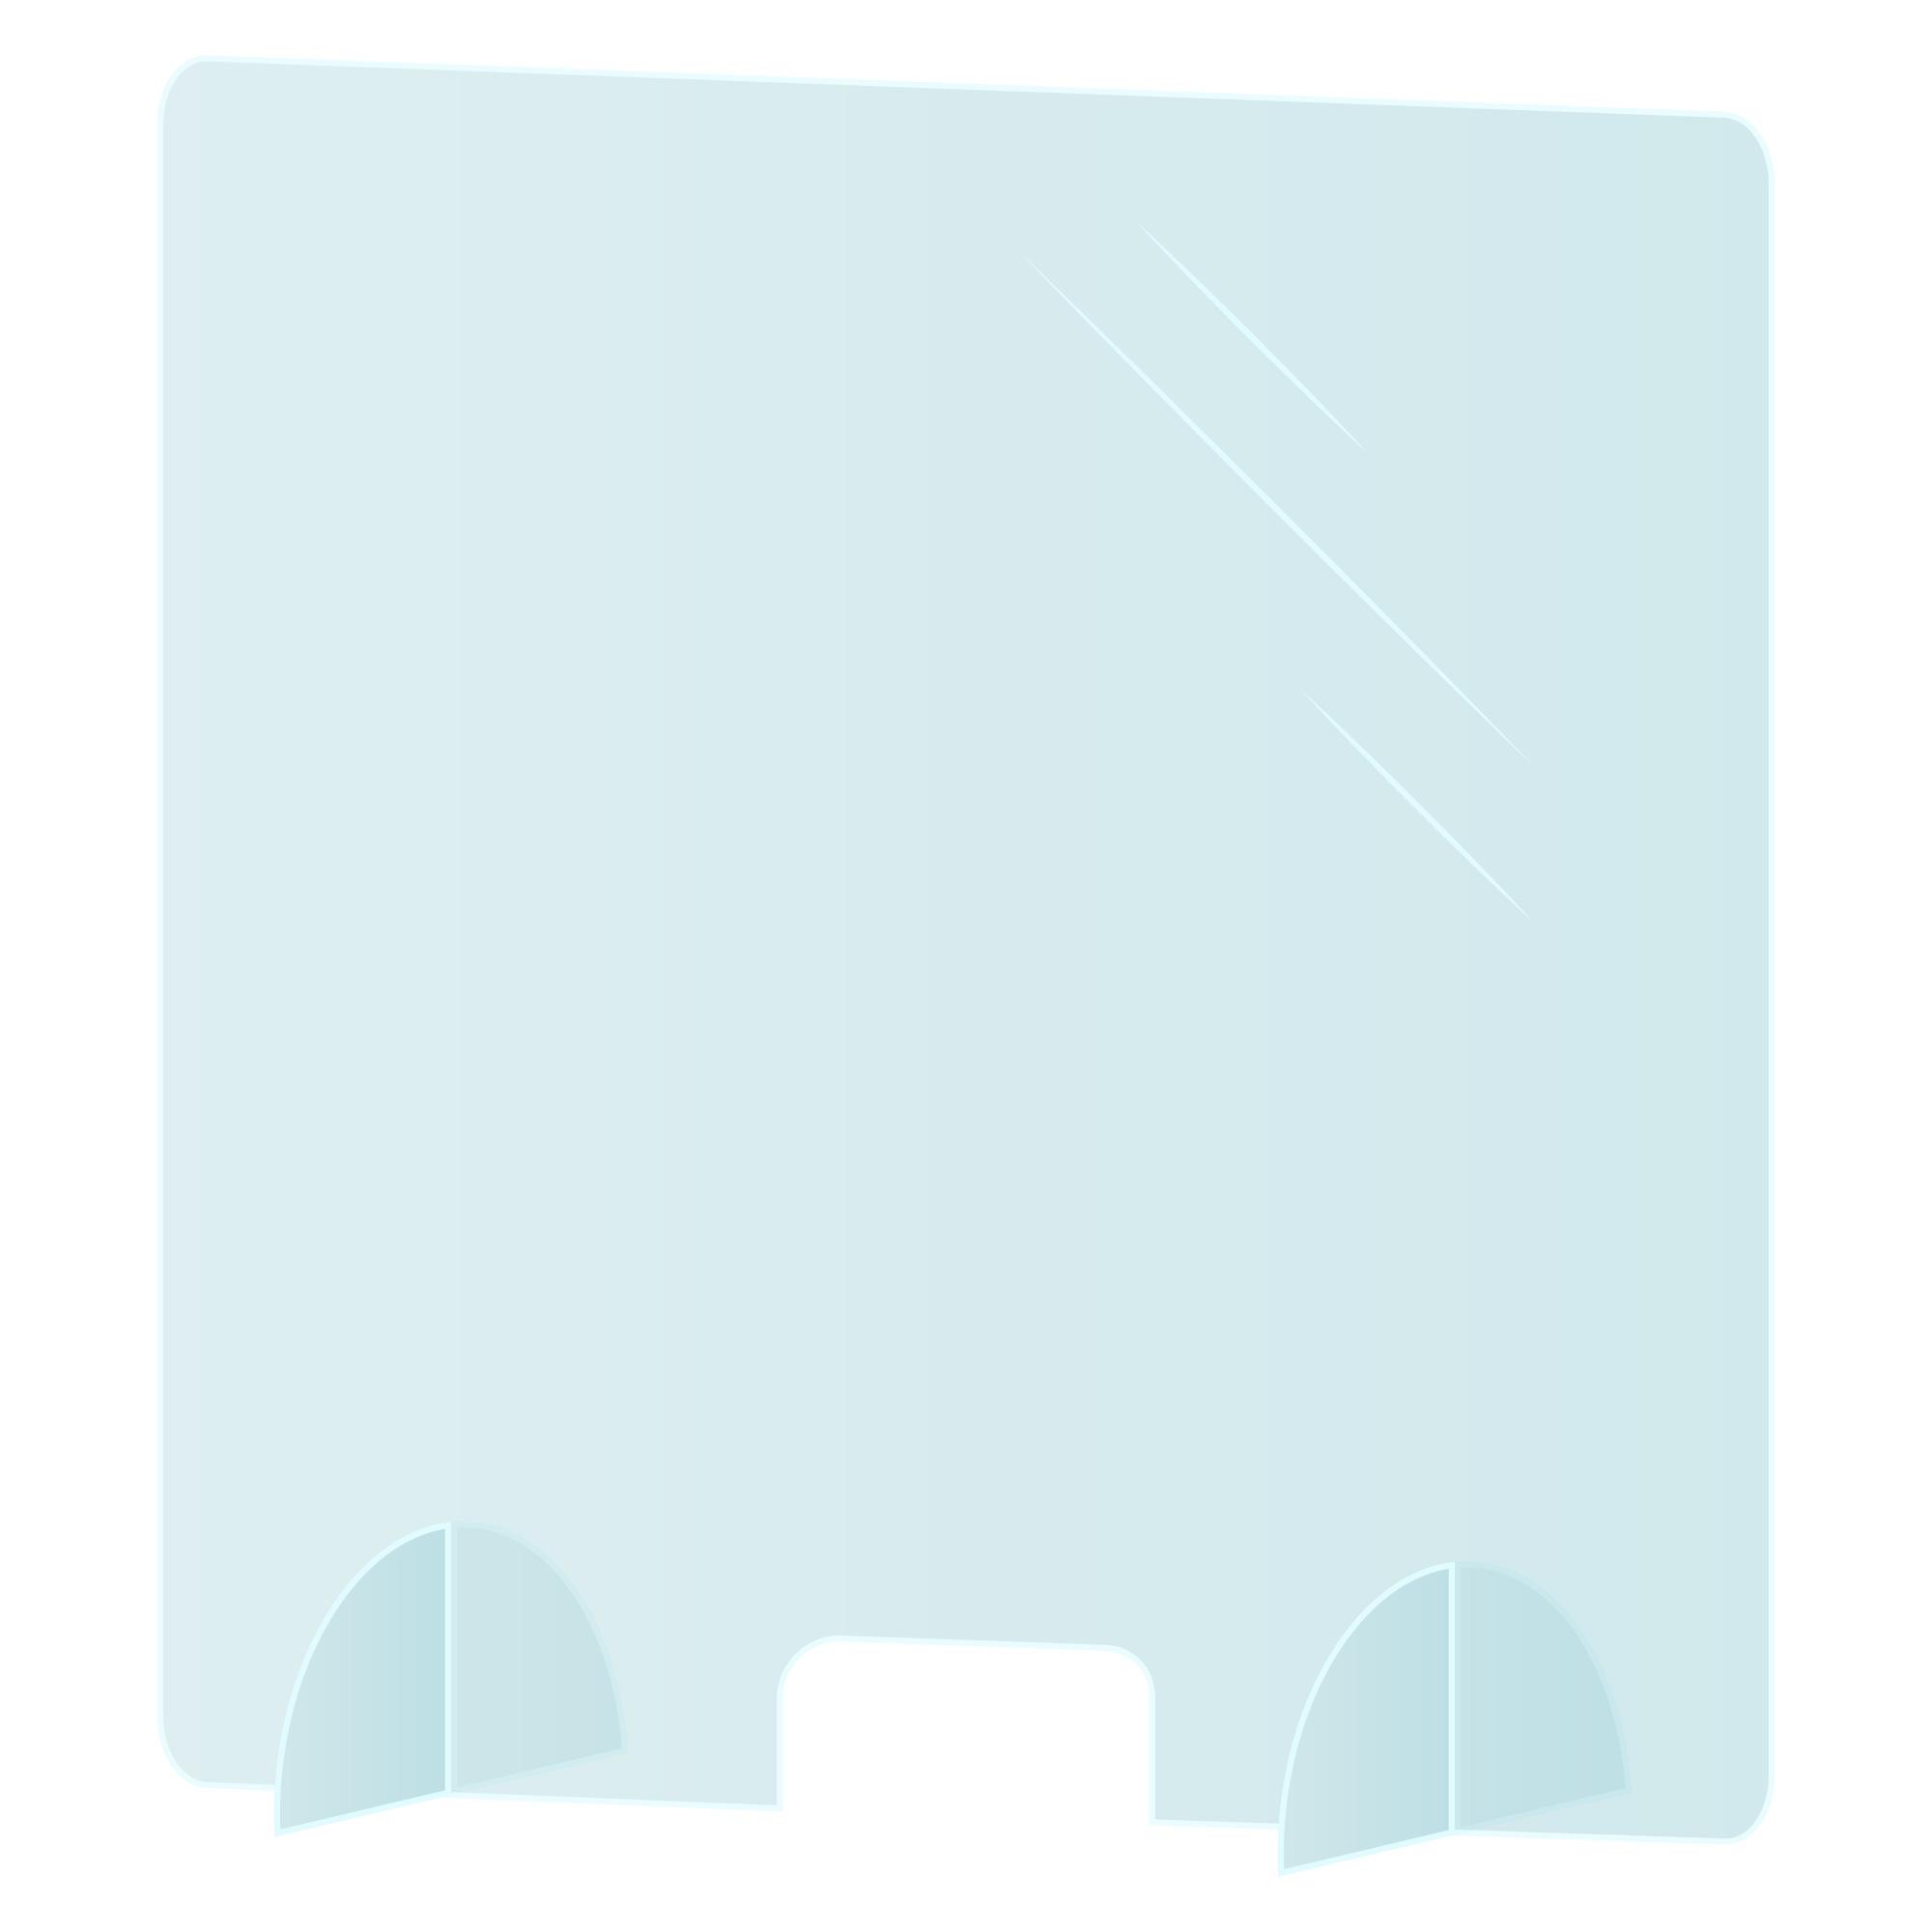 Freestanding2-01